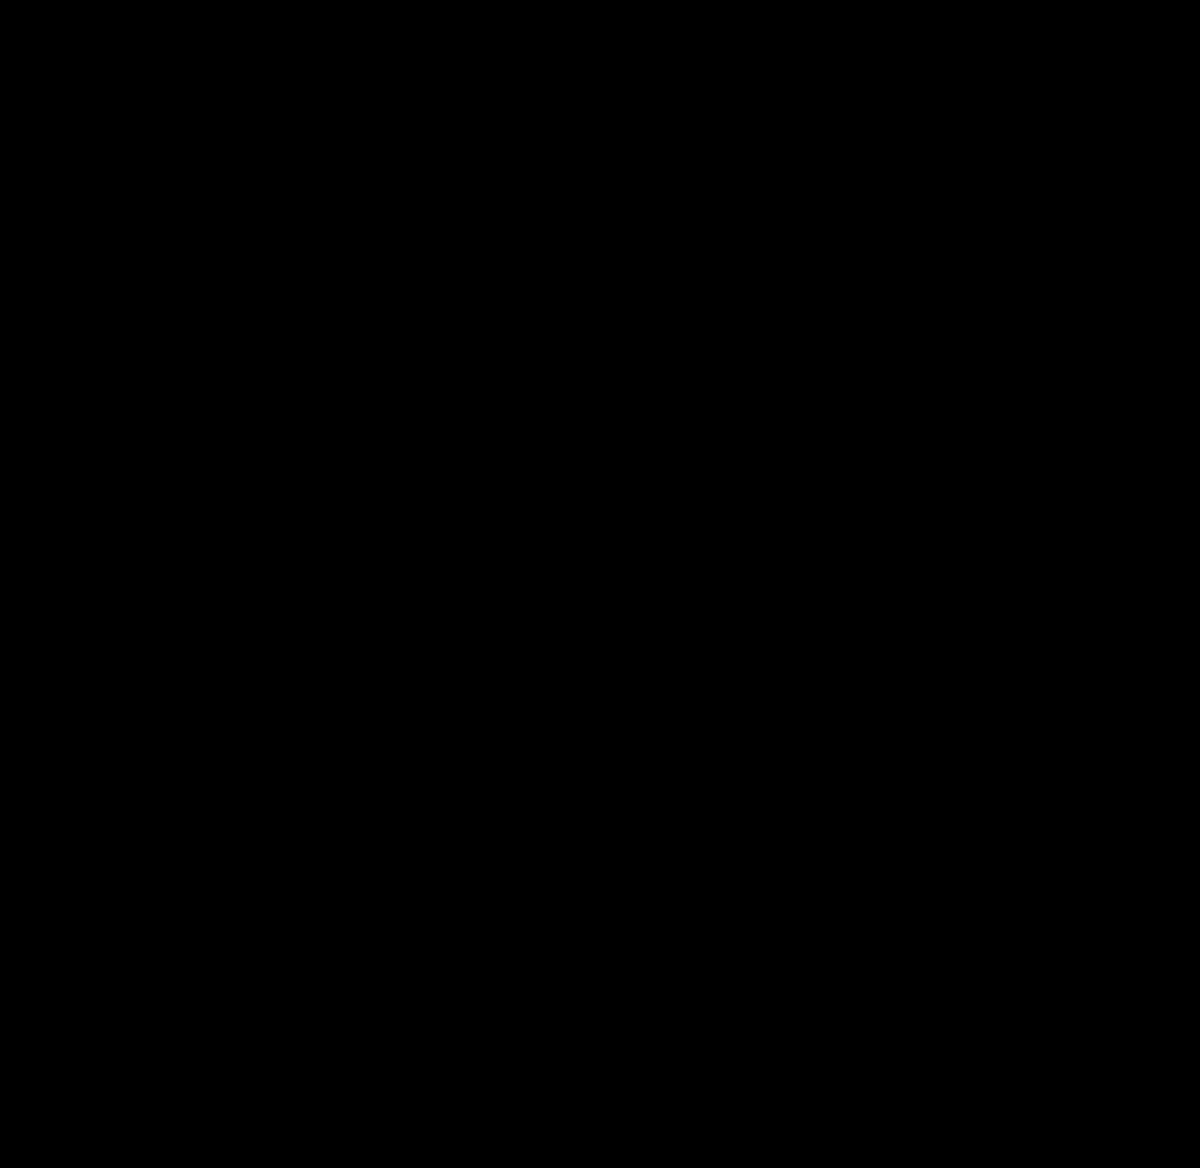 Double Happiness (calligraphy) - Wikipedia